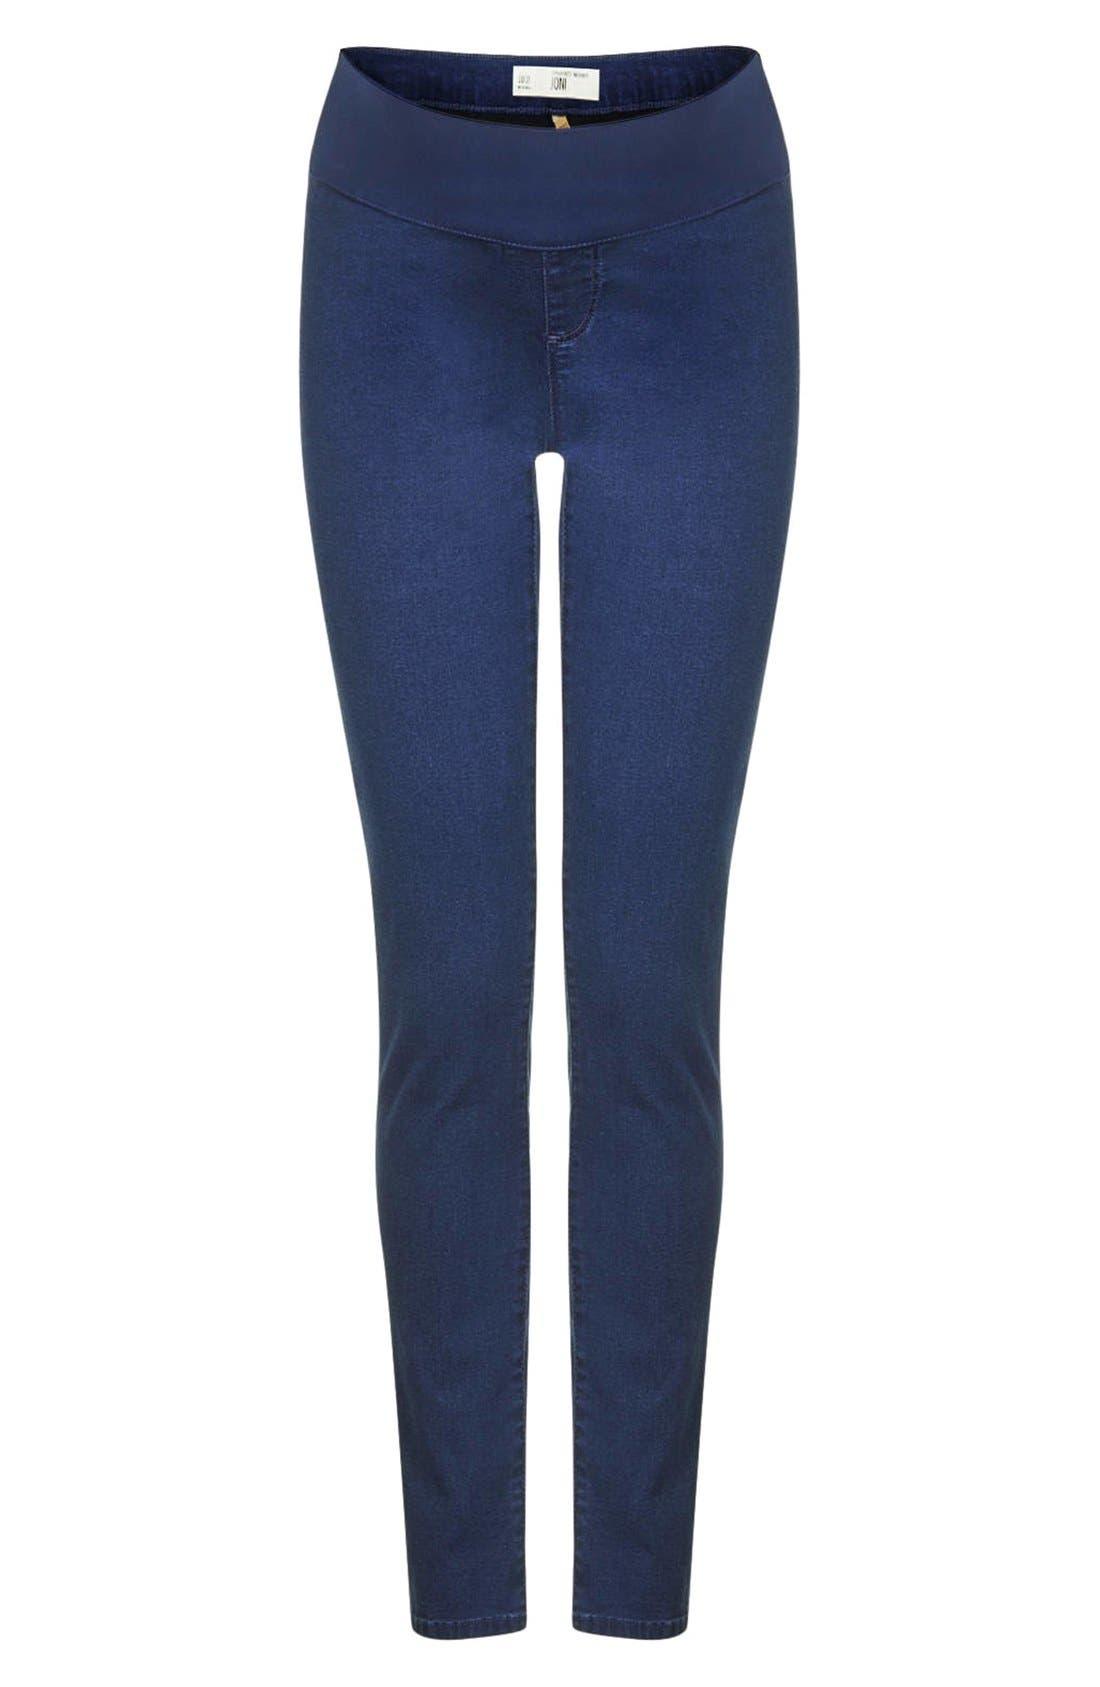 Alternate Image 1 Selected - Topshop Maternity Skinny Moto Jeans